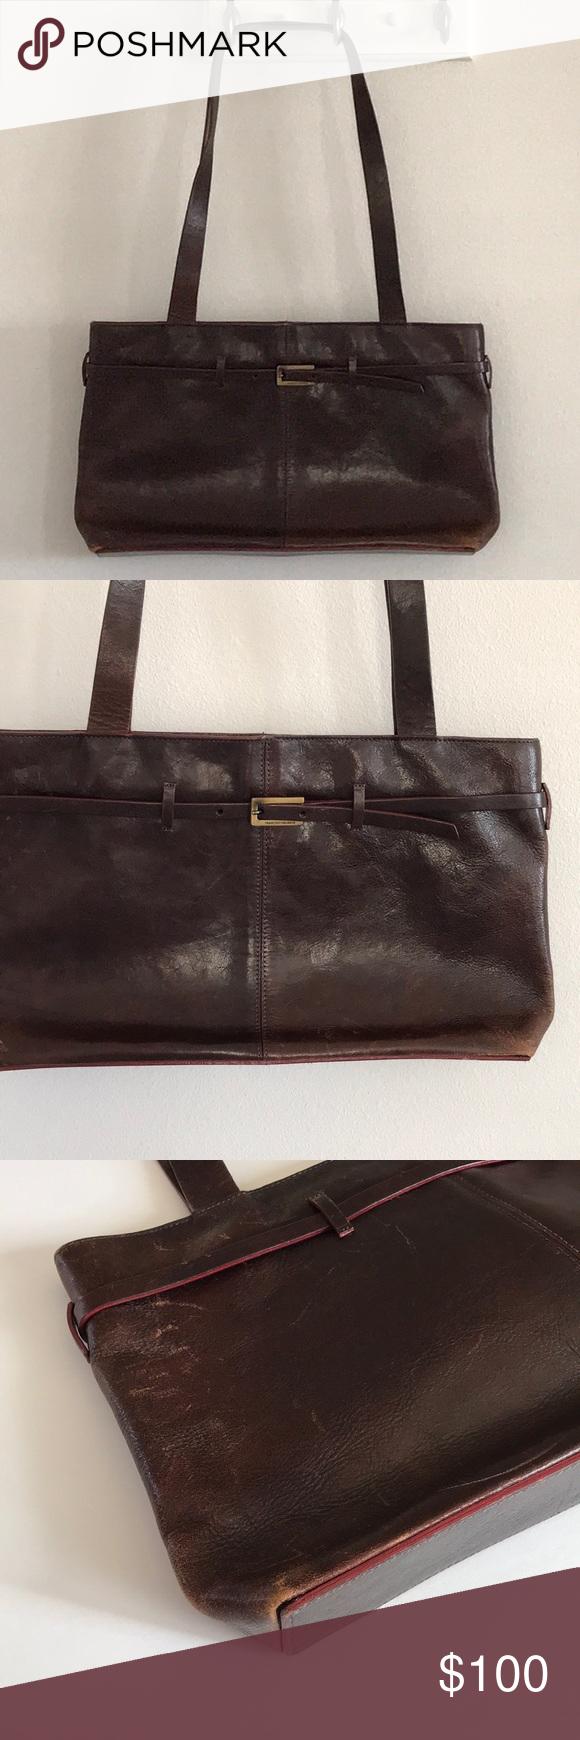 cc17937125 Francesco Biasia Leather Satchel bag   purse Vintage Biasia handbag. Supple  rich aged burgundy leather